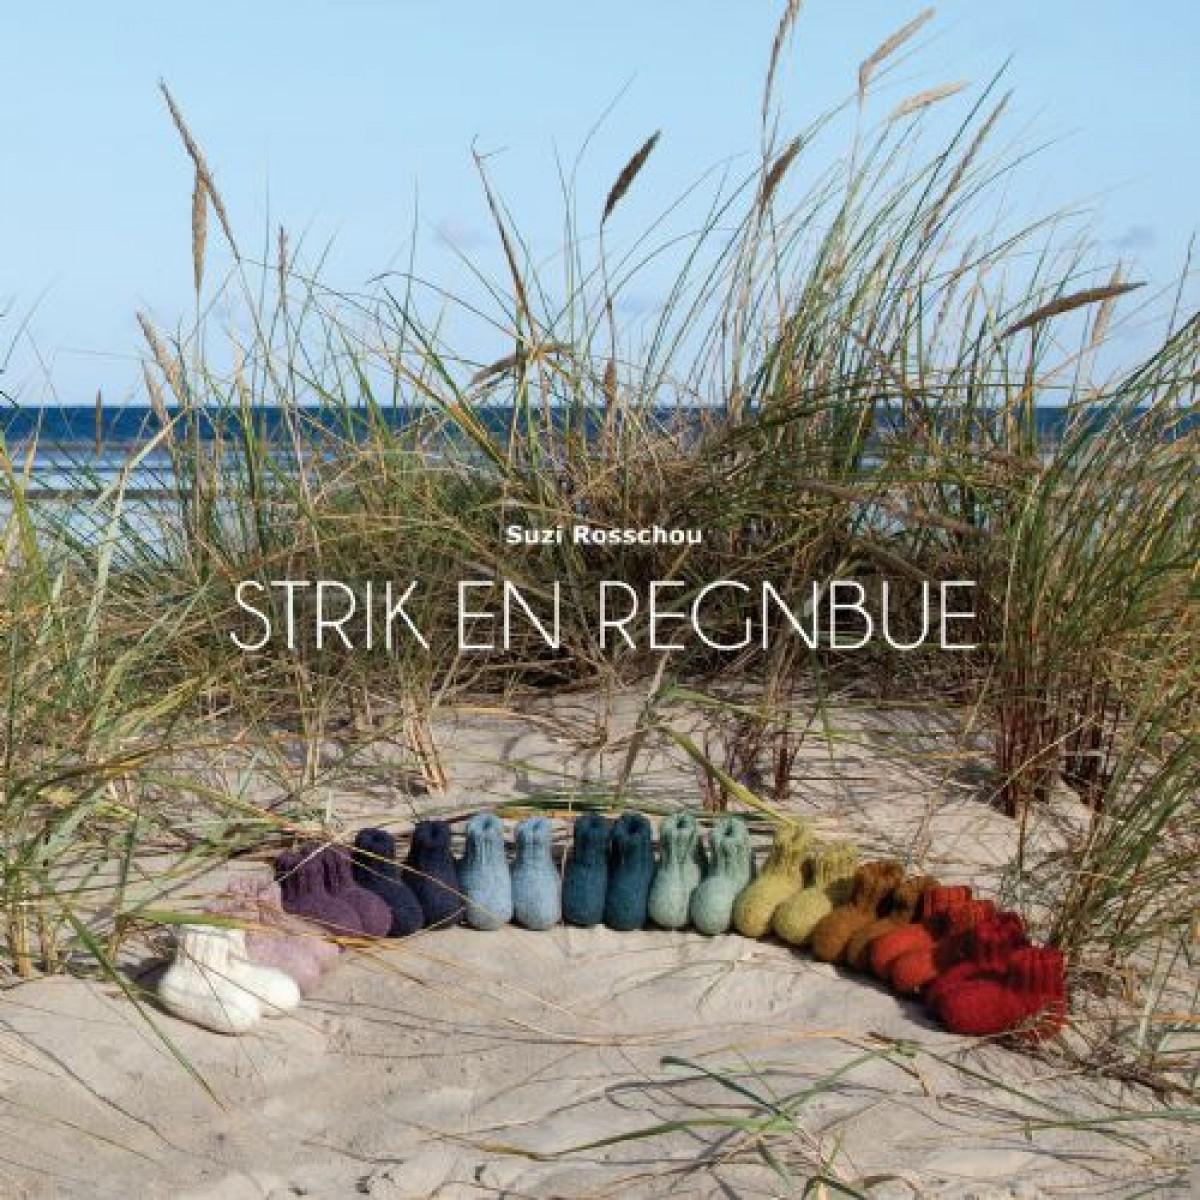 Strik en regnbue-31